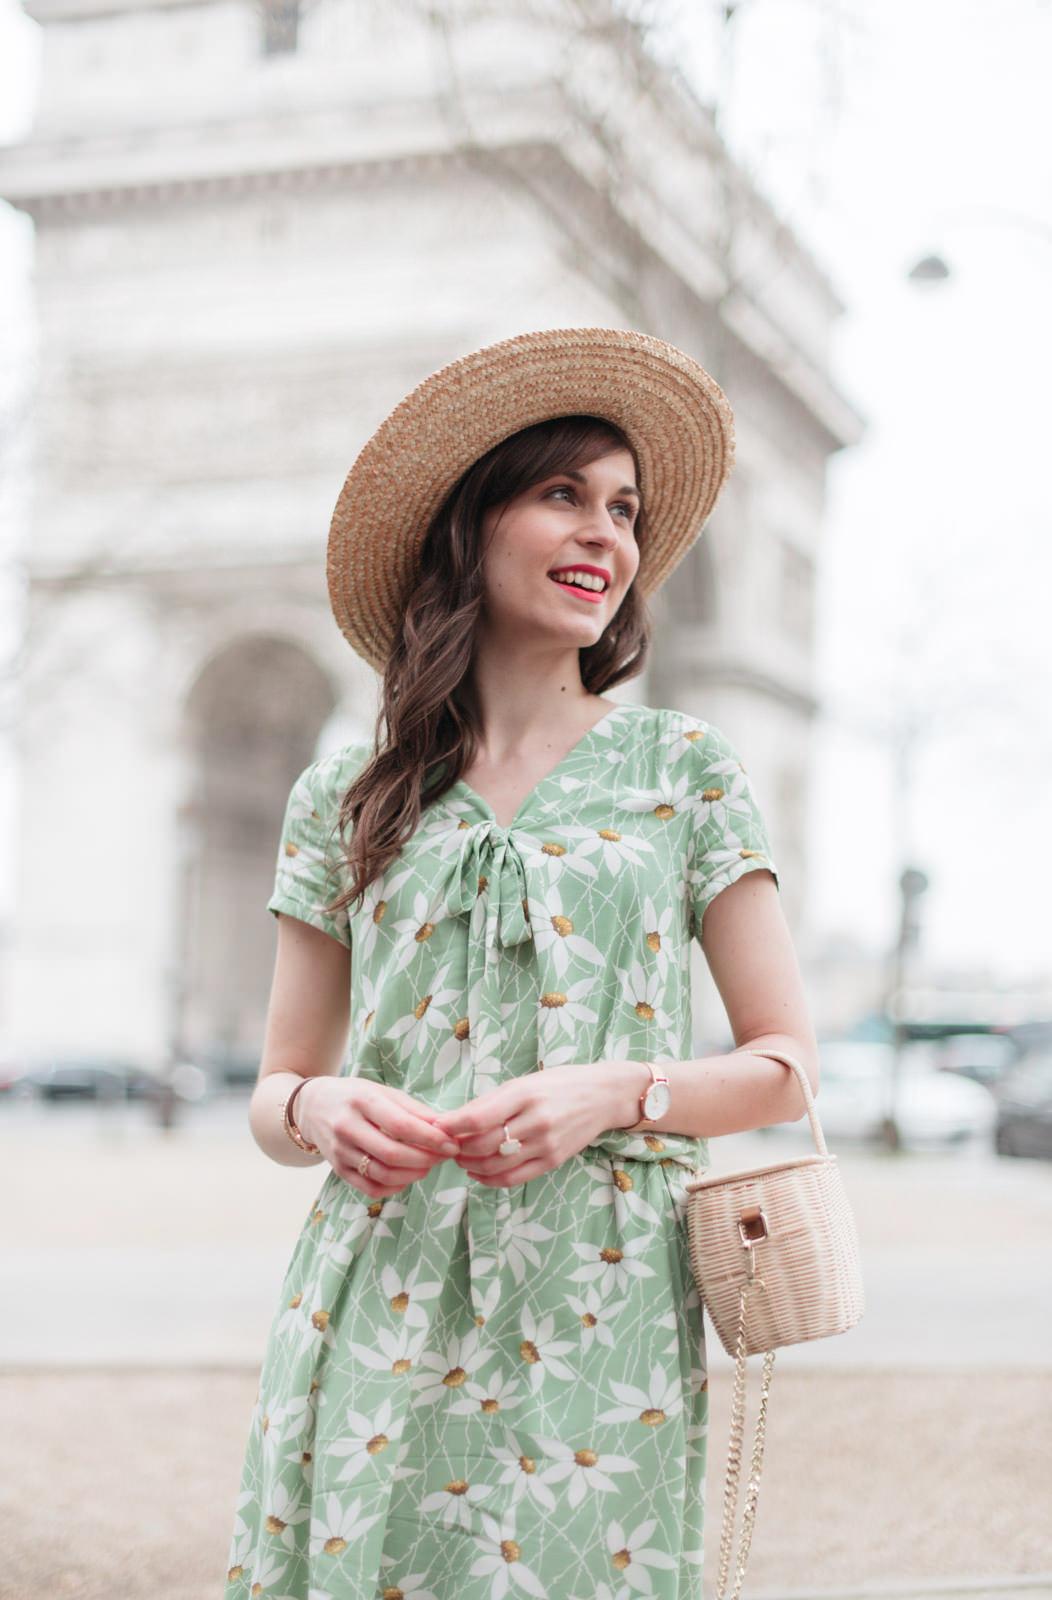 Blog-Mode-And-The-City-Looks-Robe-Fleuri-Arc-de-Triomphe-10